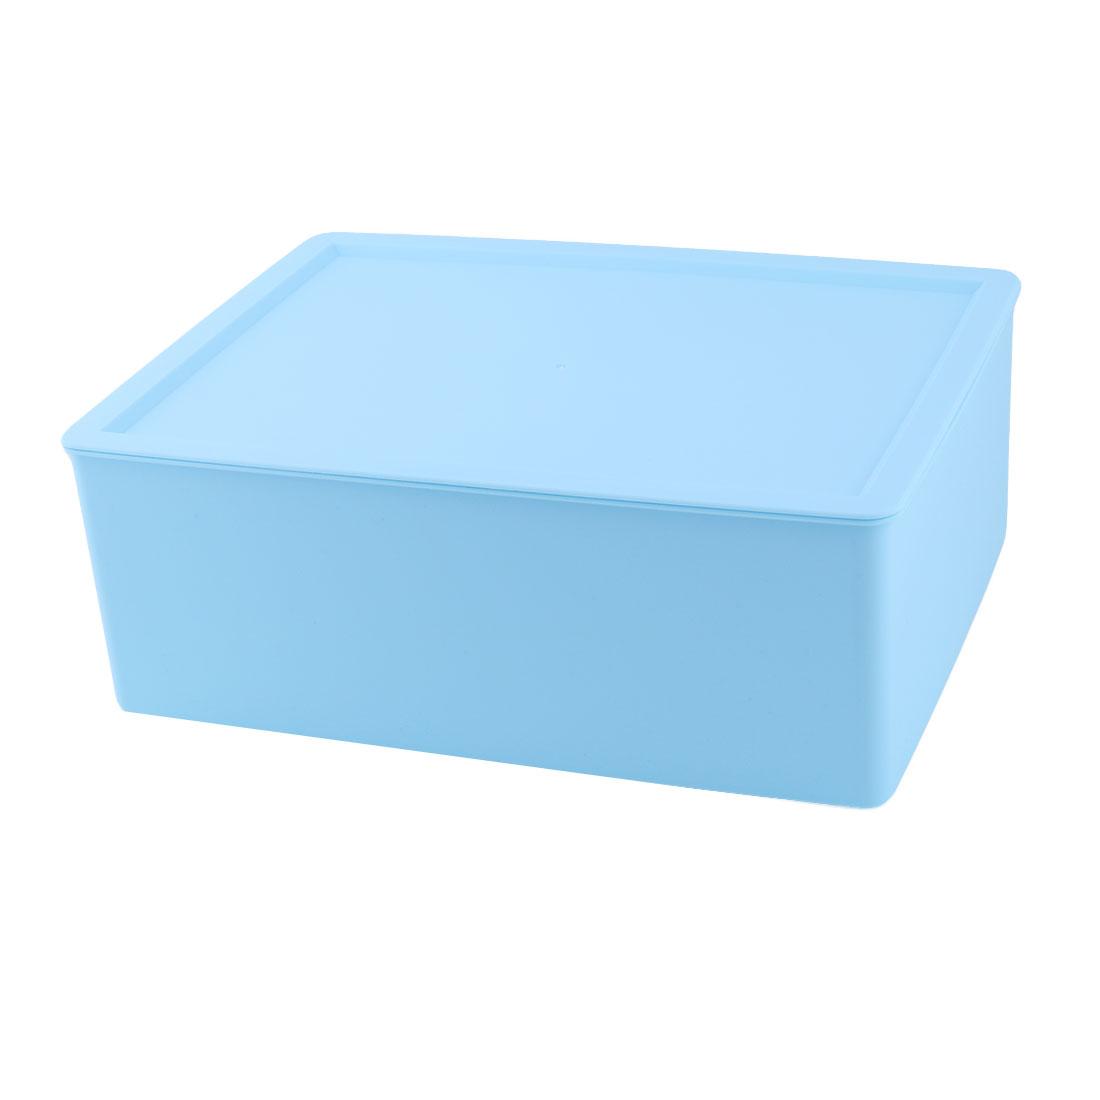 Family Plastic Rectangle Dresser Decor Cosmetic Underwear Socks Storage Holder Box Blue